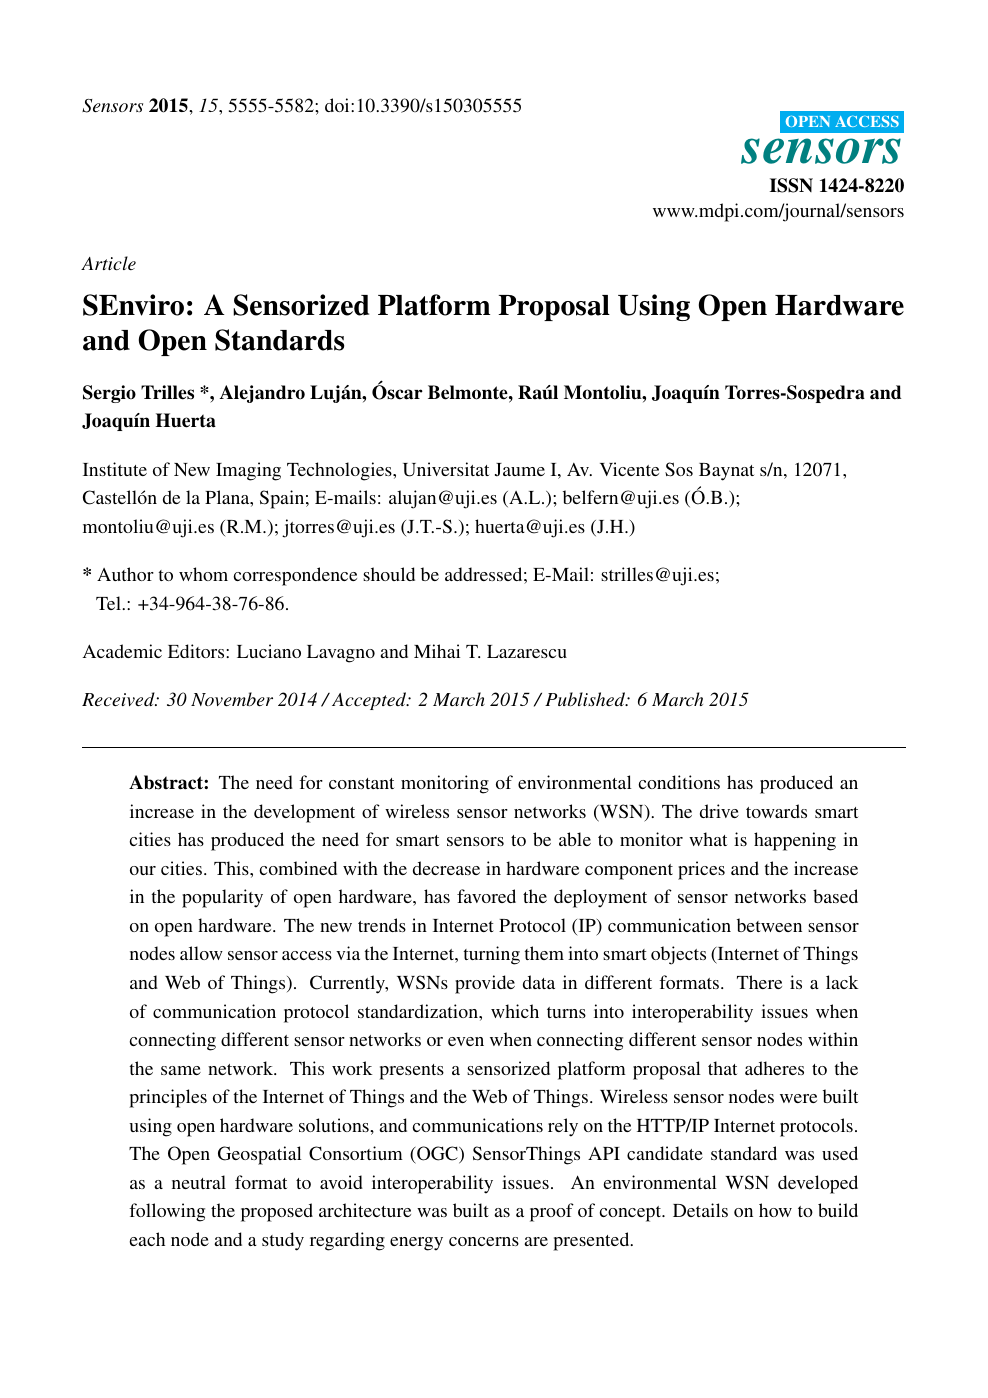 SEnviro: A Sensorized Platform Proposal Using Open Hardware